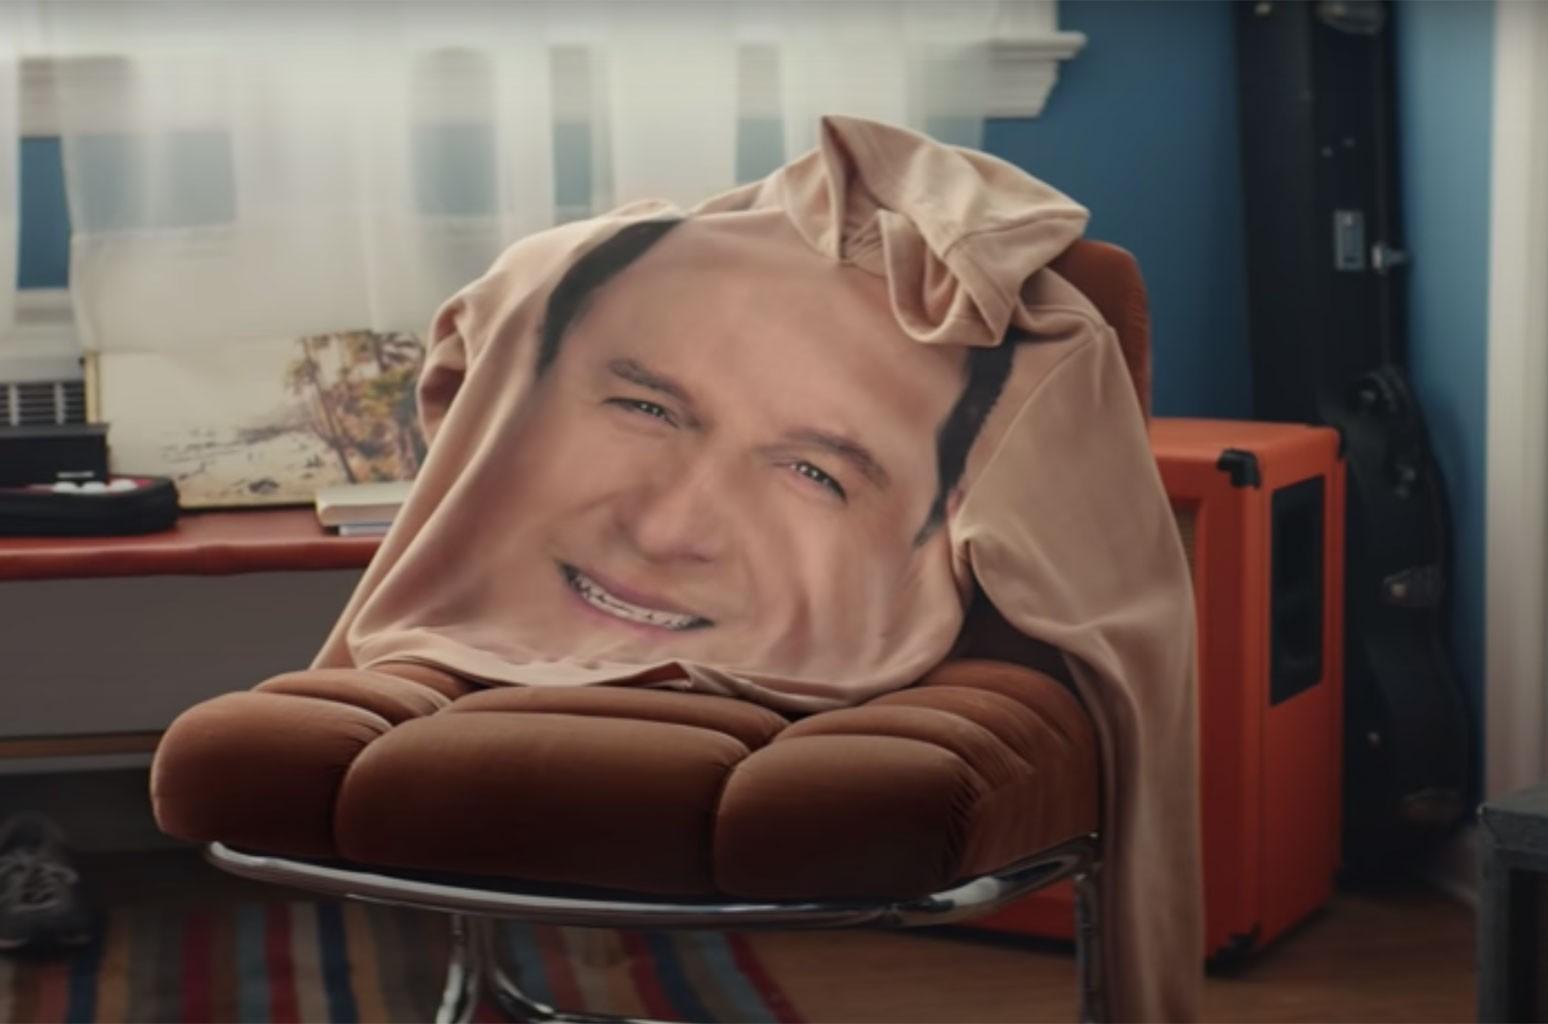 The Jason Alexander Hoodie Tide Super Bowl 55 Commercial